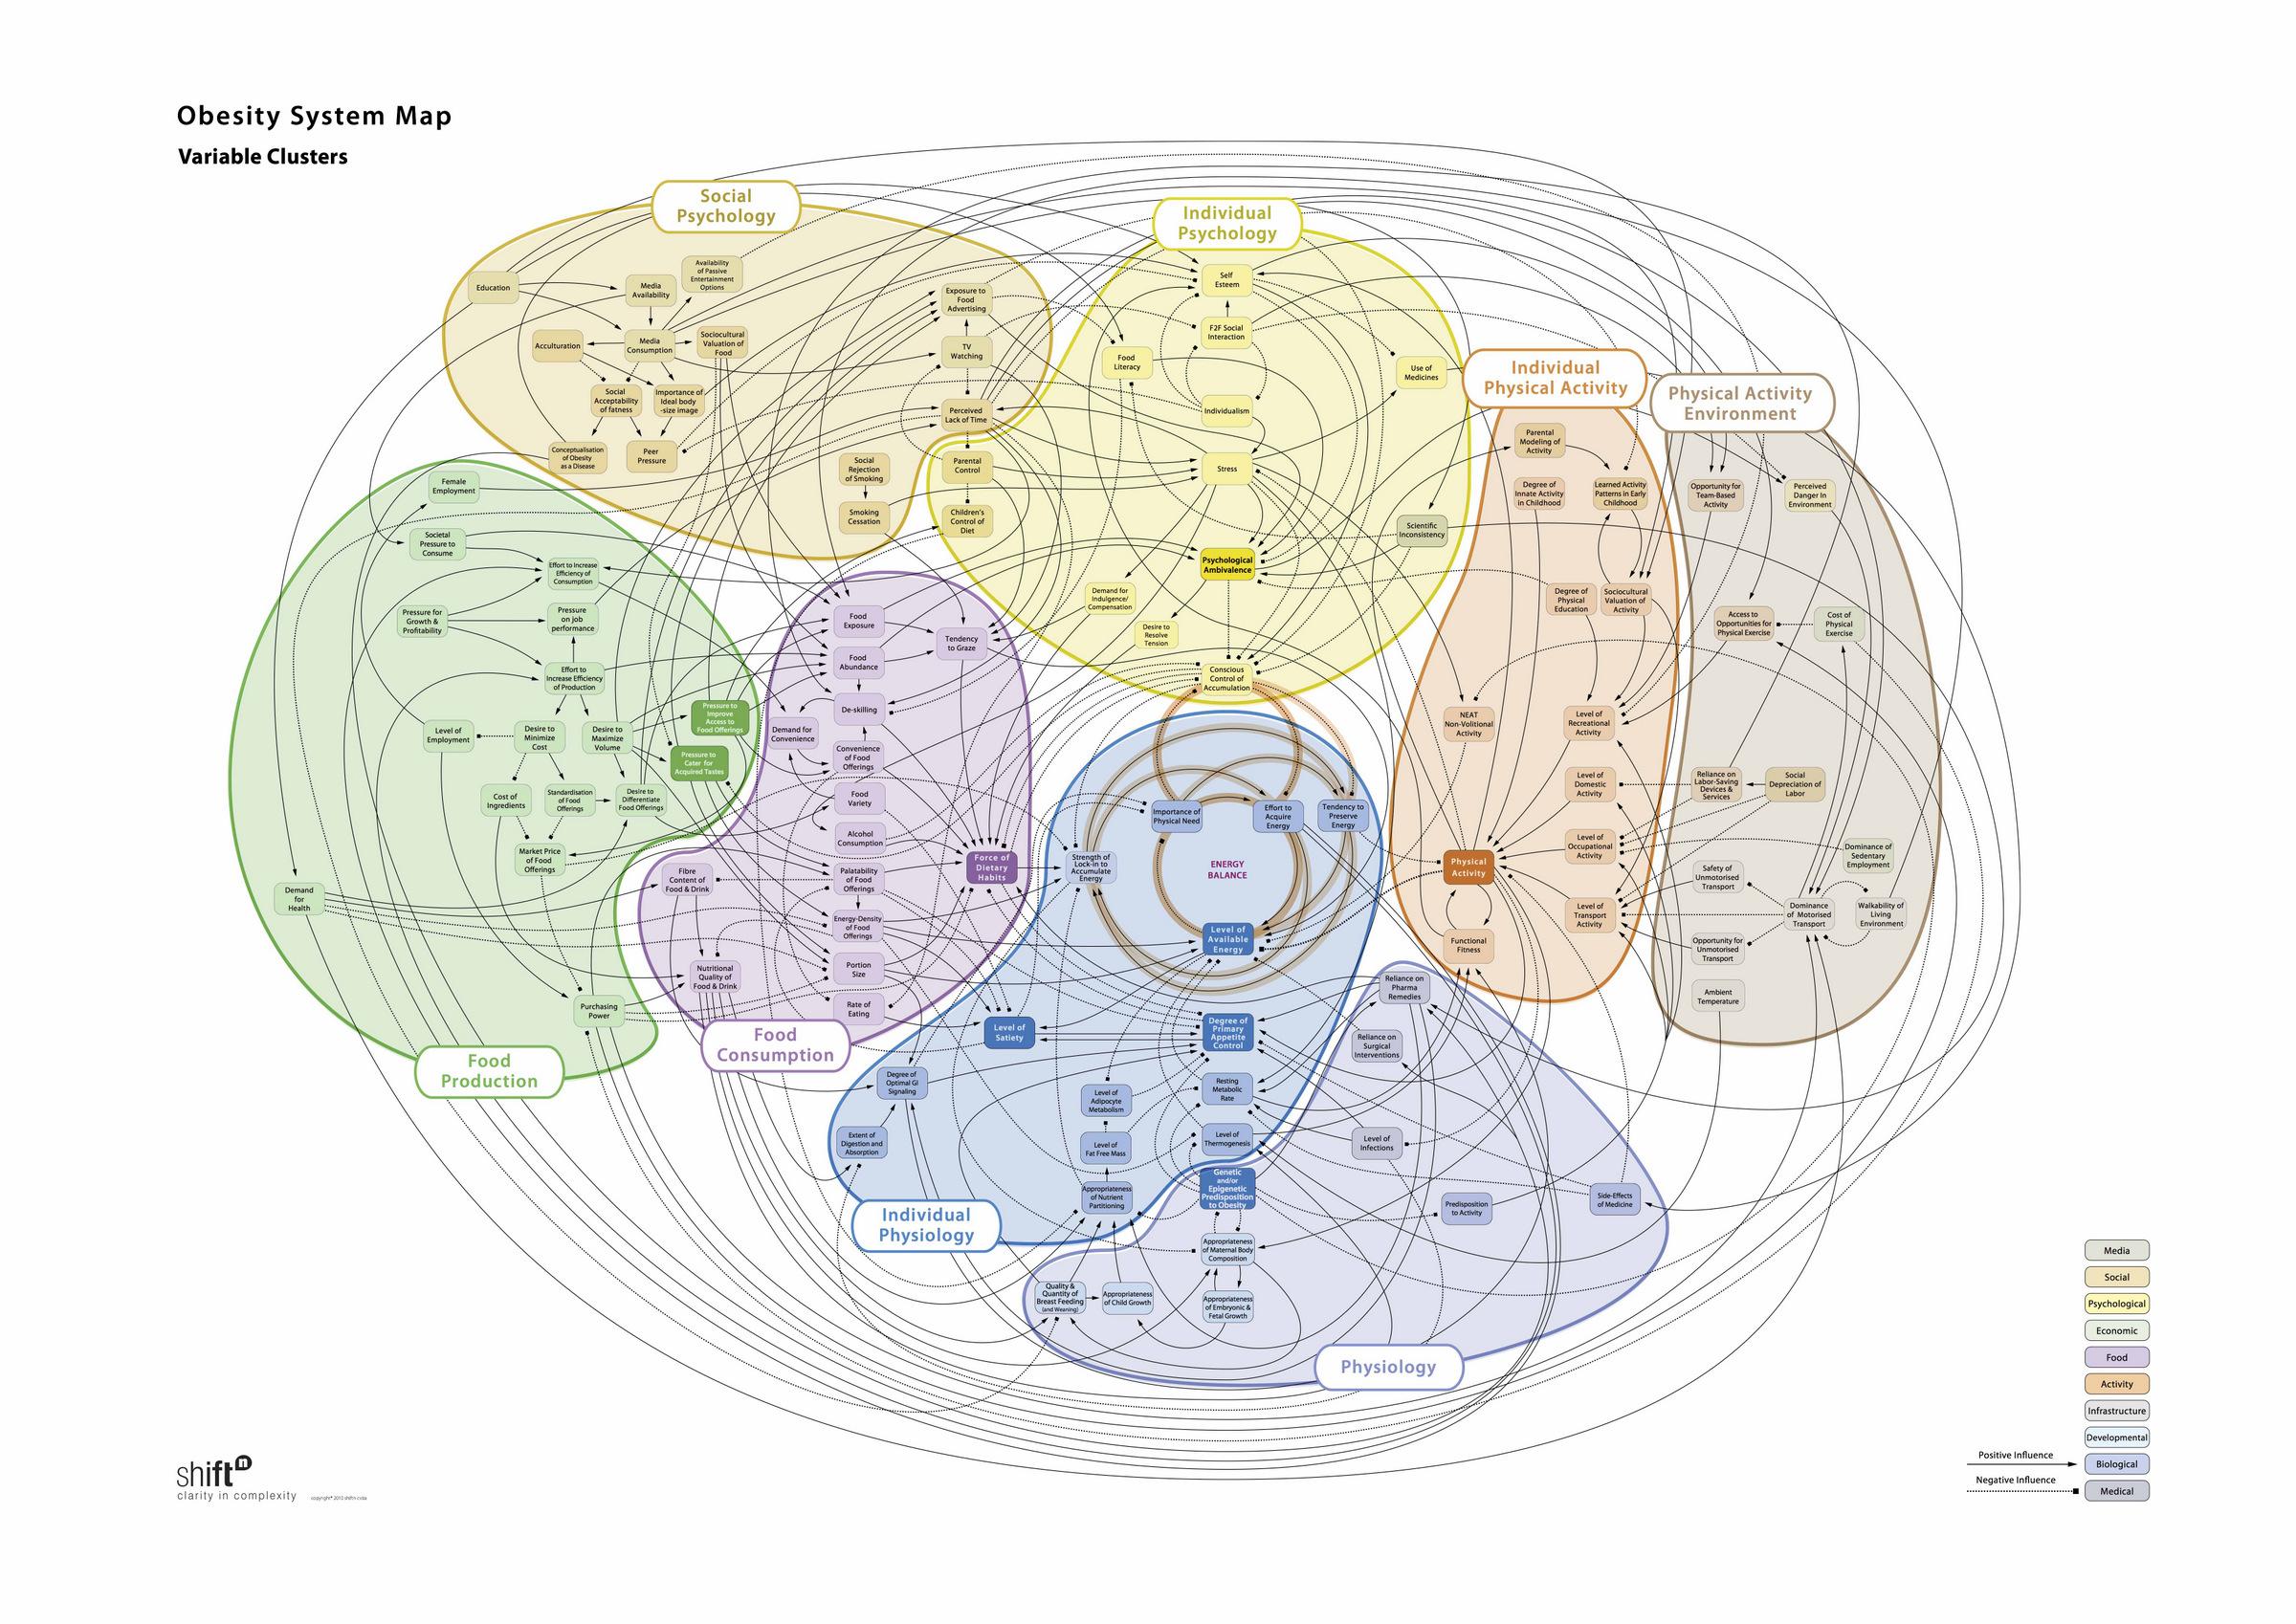 Obesity System Map